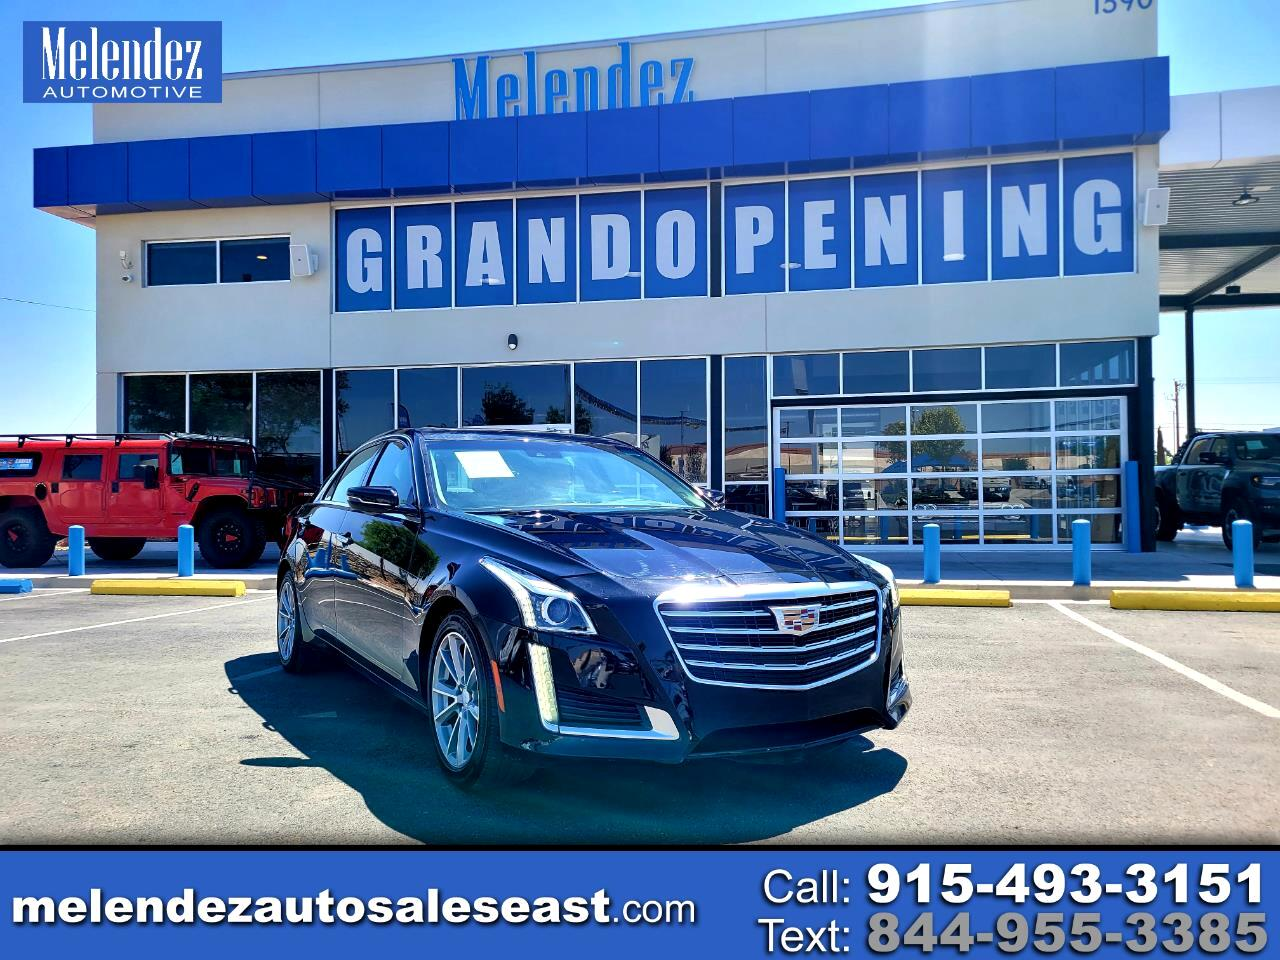 Cadillac CTS Sedan 4dr Sdn 3.6L Luxury RWD 2019